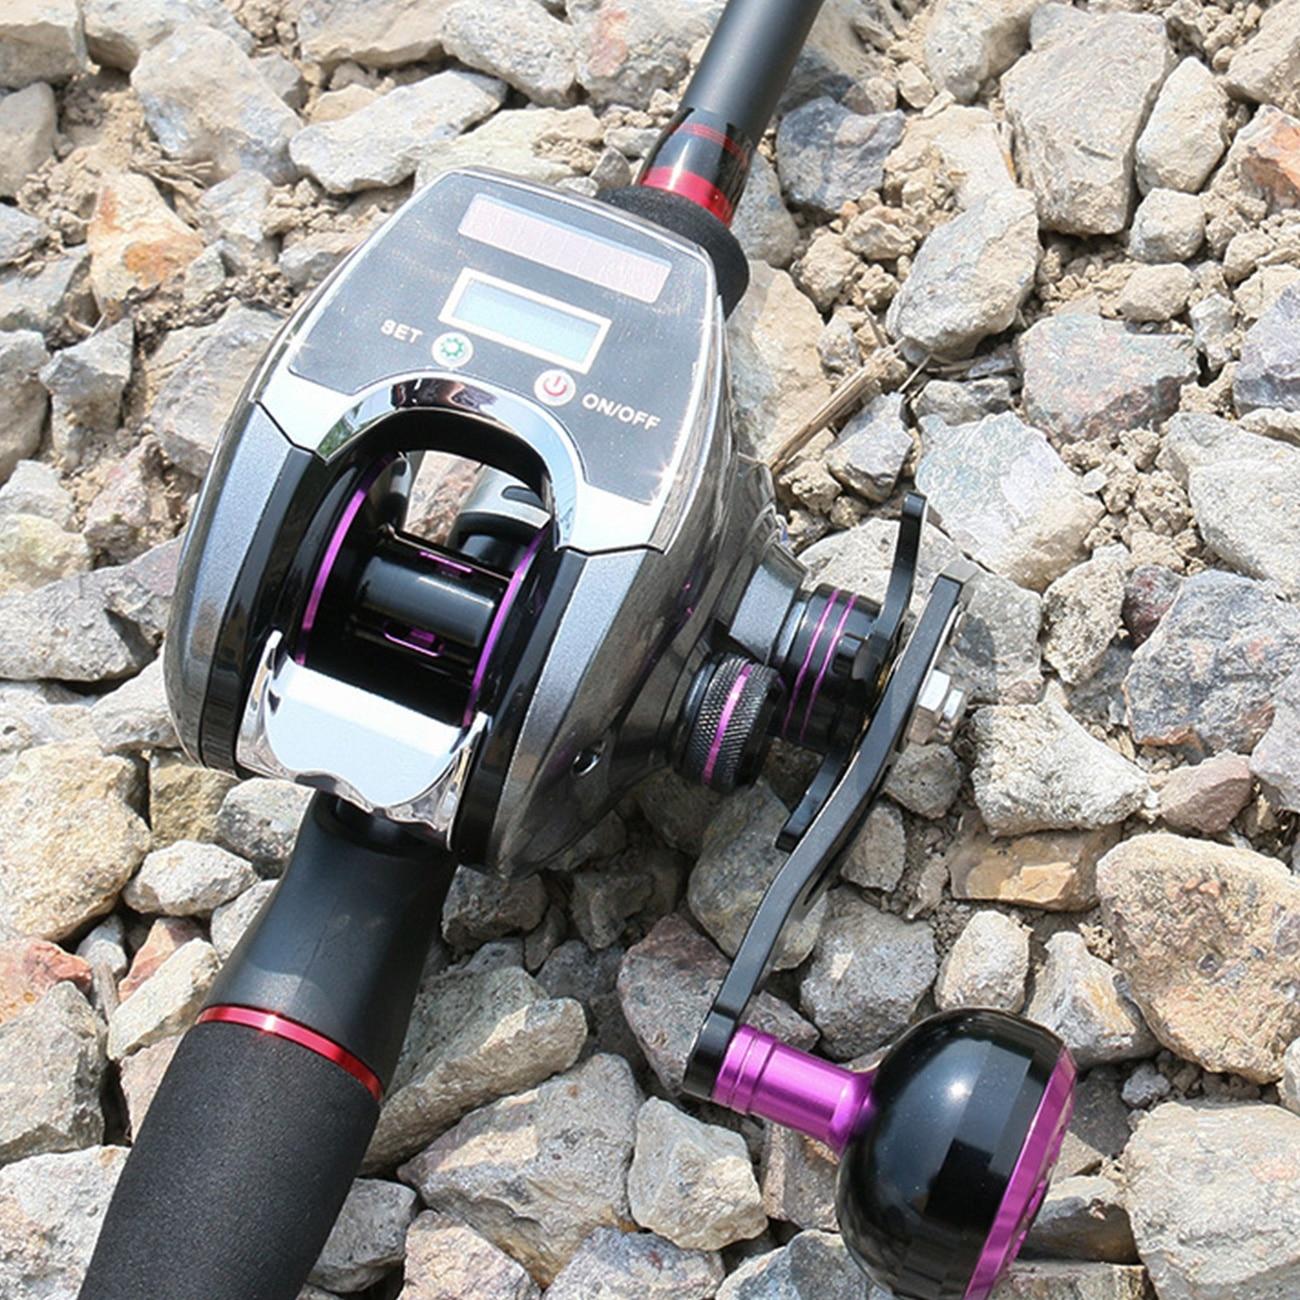 Solar Powered Fishing Reel Rechargeable Digital Display Baitcasting Reel Professional Spinning Fishing Reel enlarge